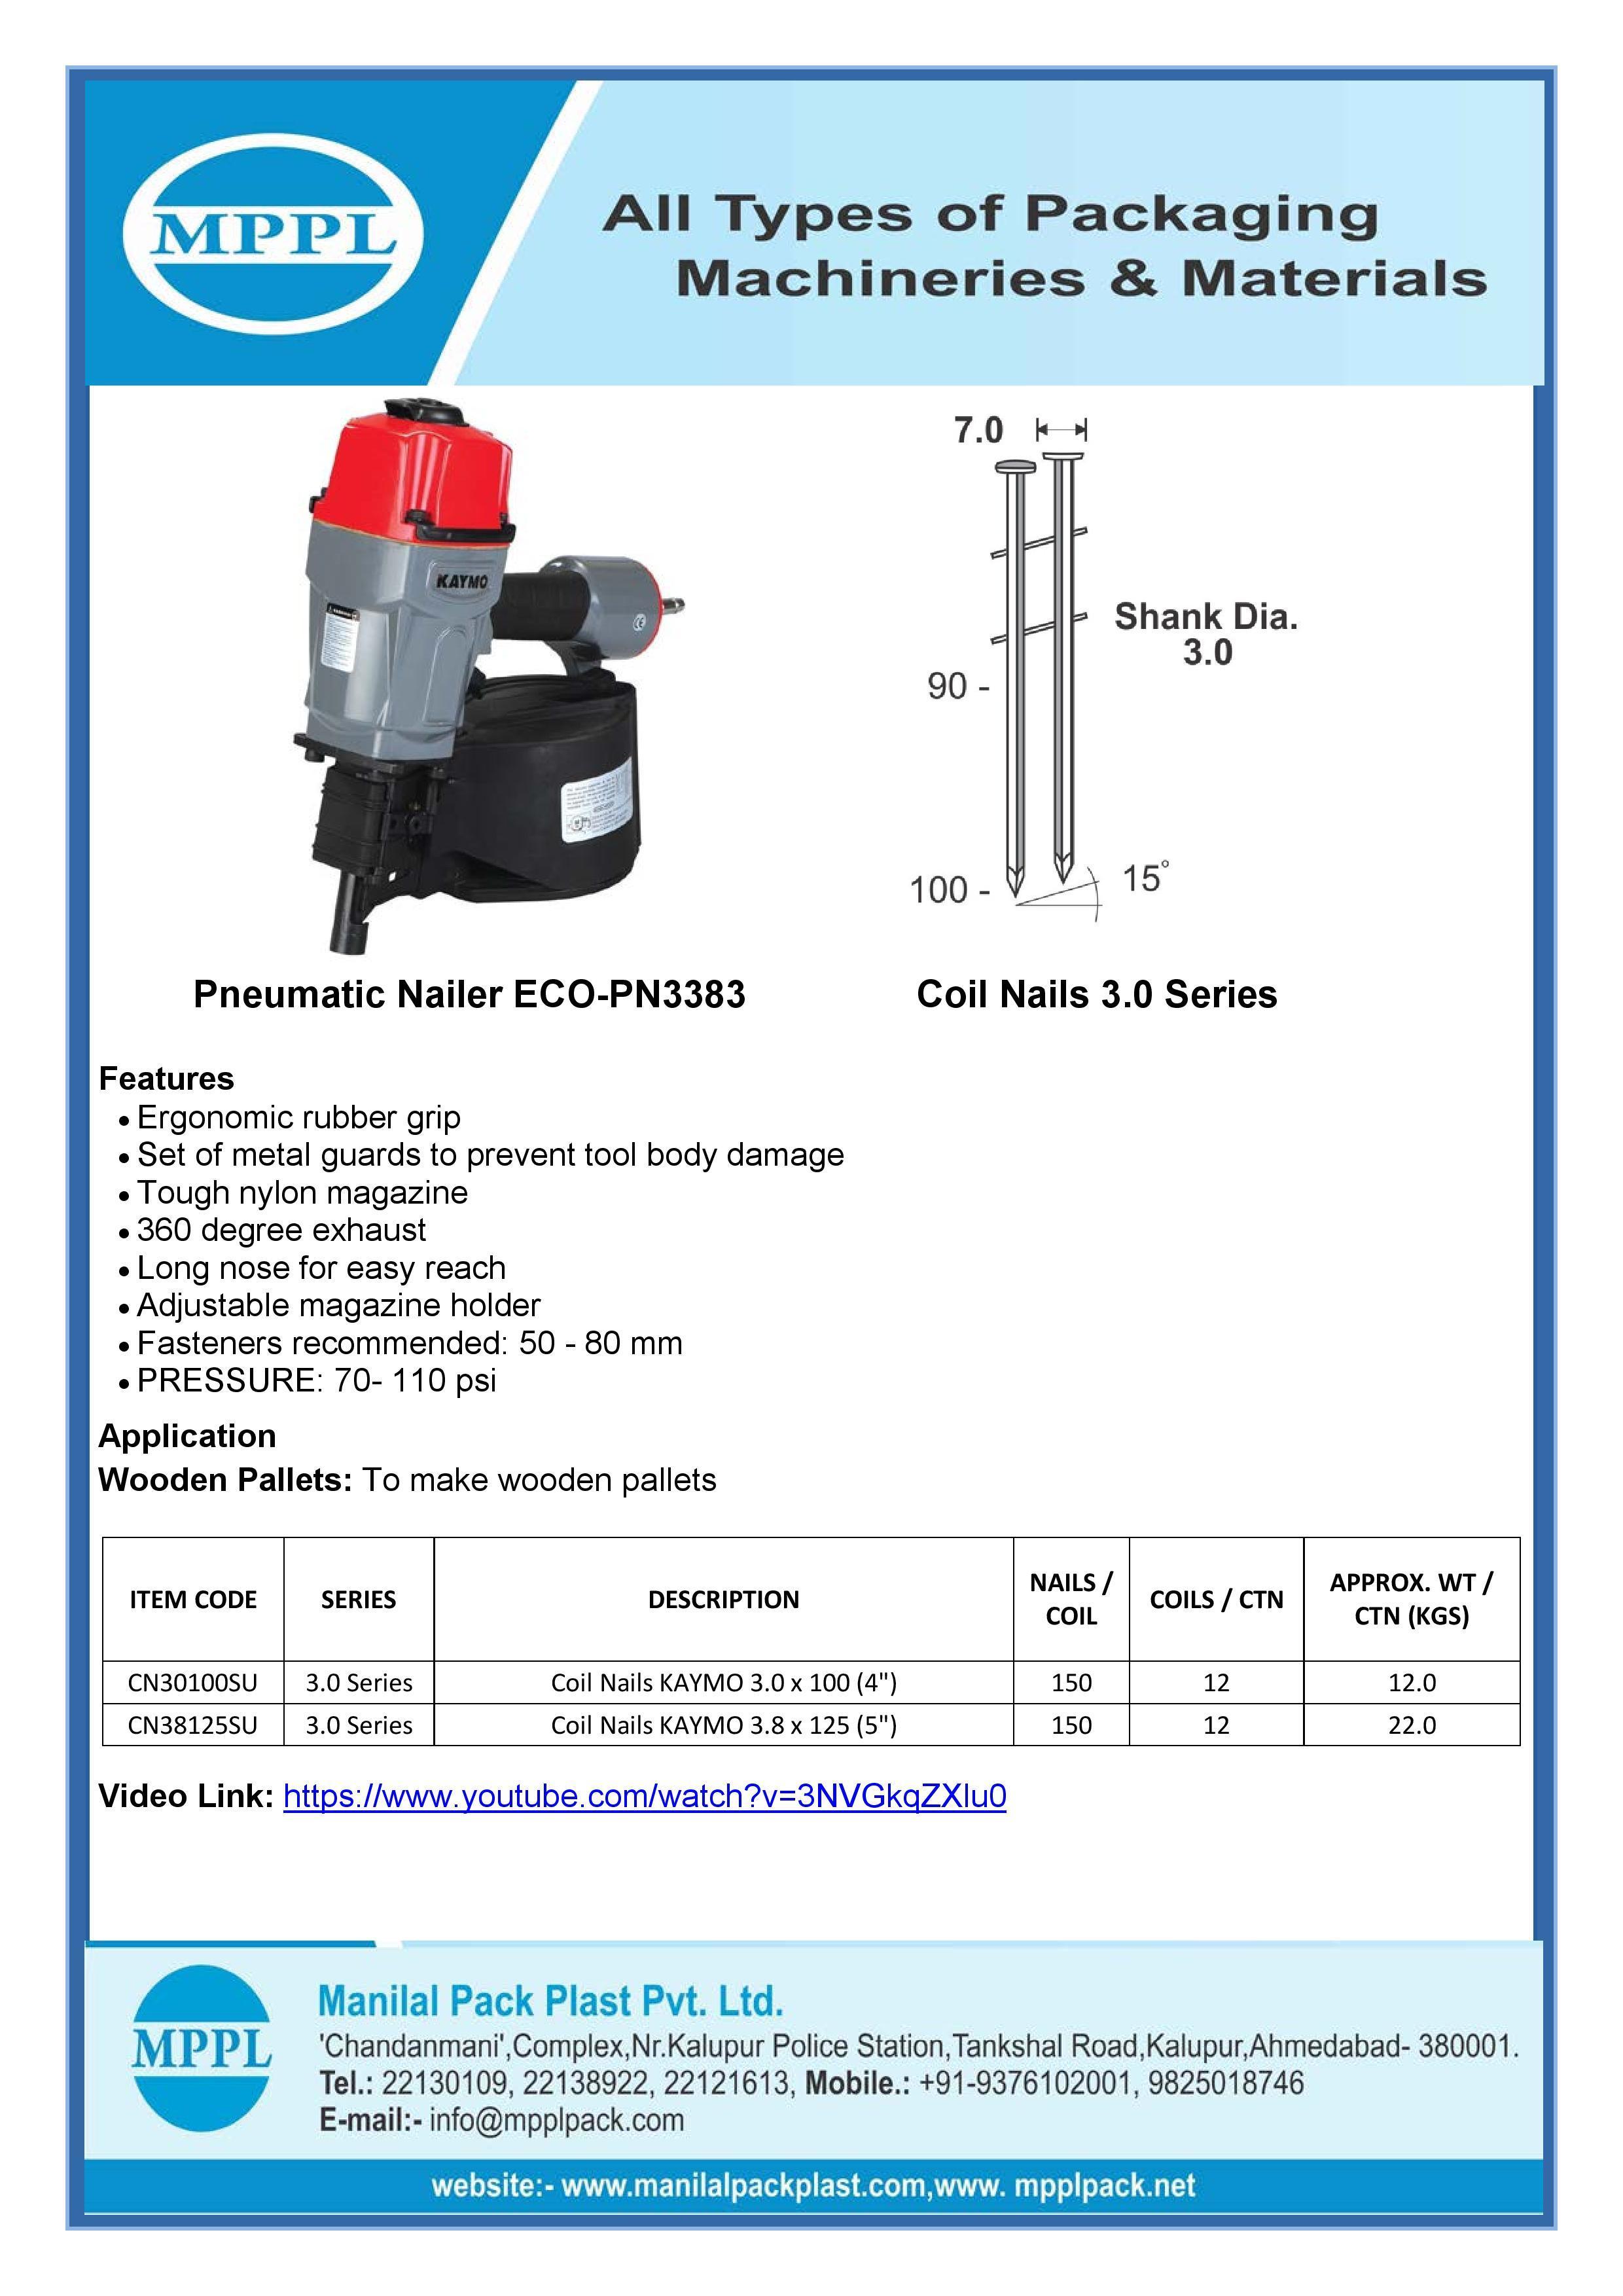 Pneumatic Nailer ECO-PN3383